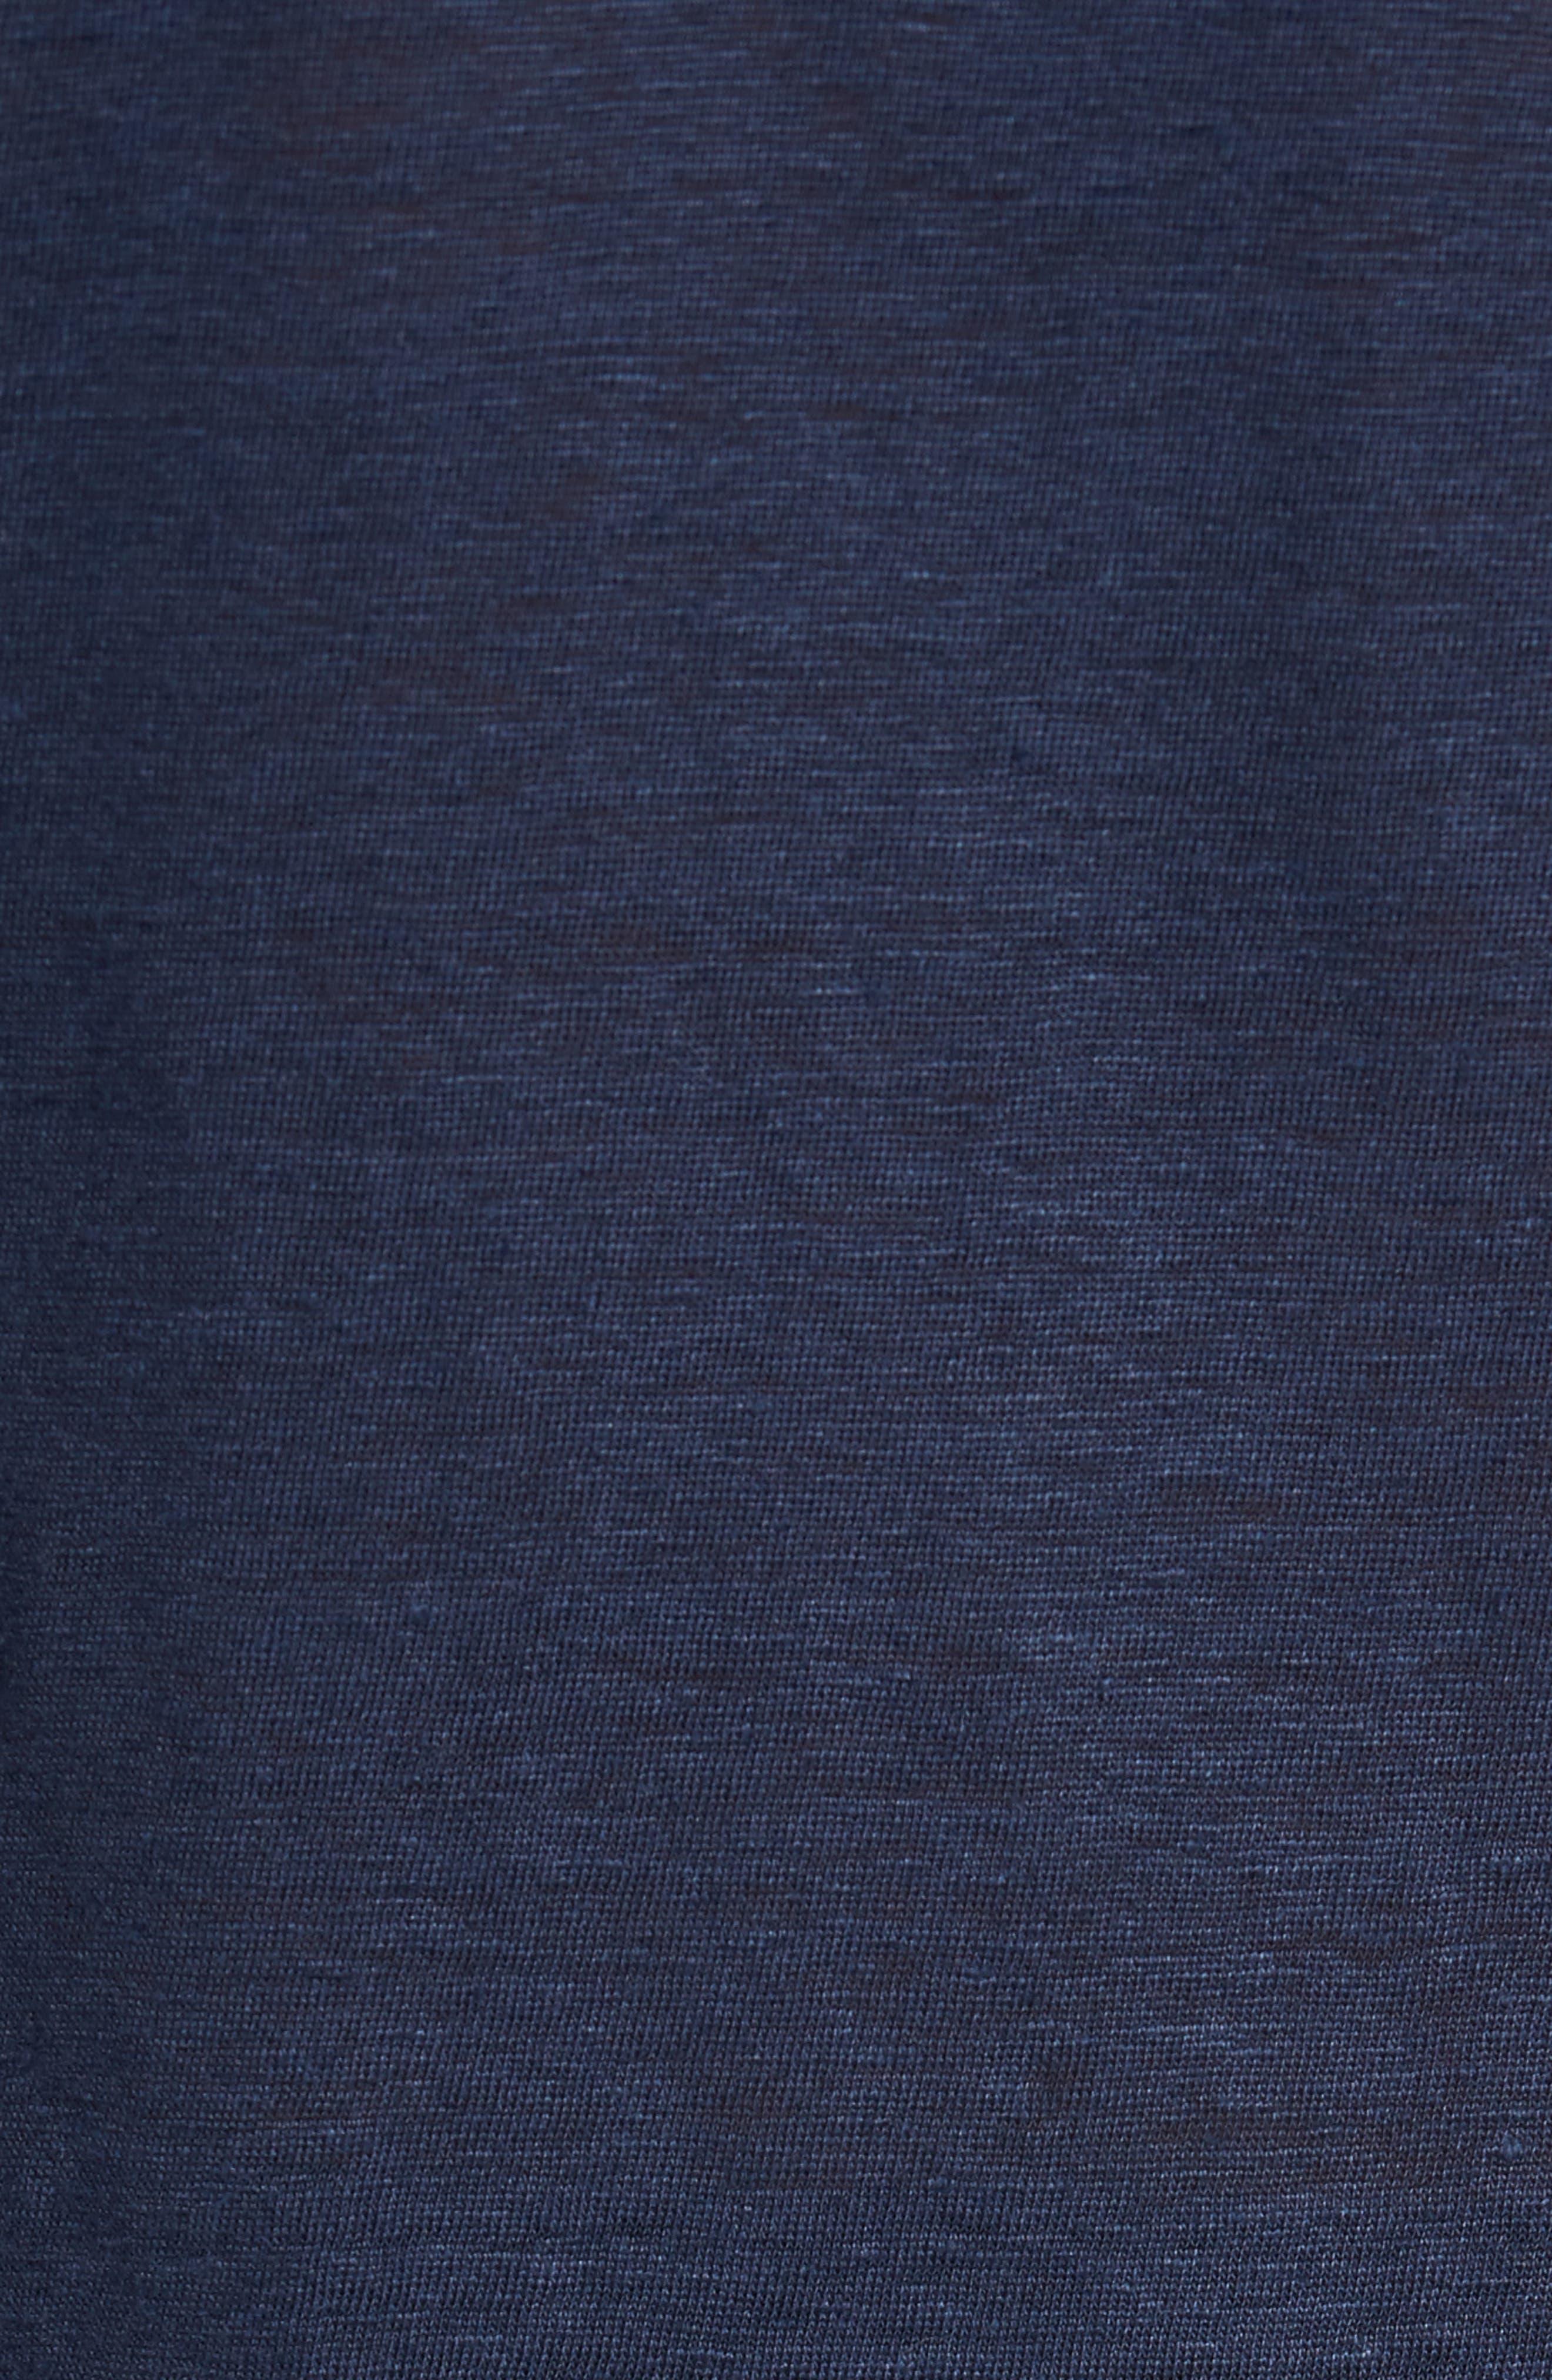 Linen Slub Jersey Linen Polo,                             Alternate thumbnail 5, color,                             NAVY